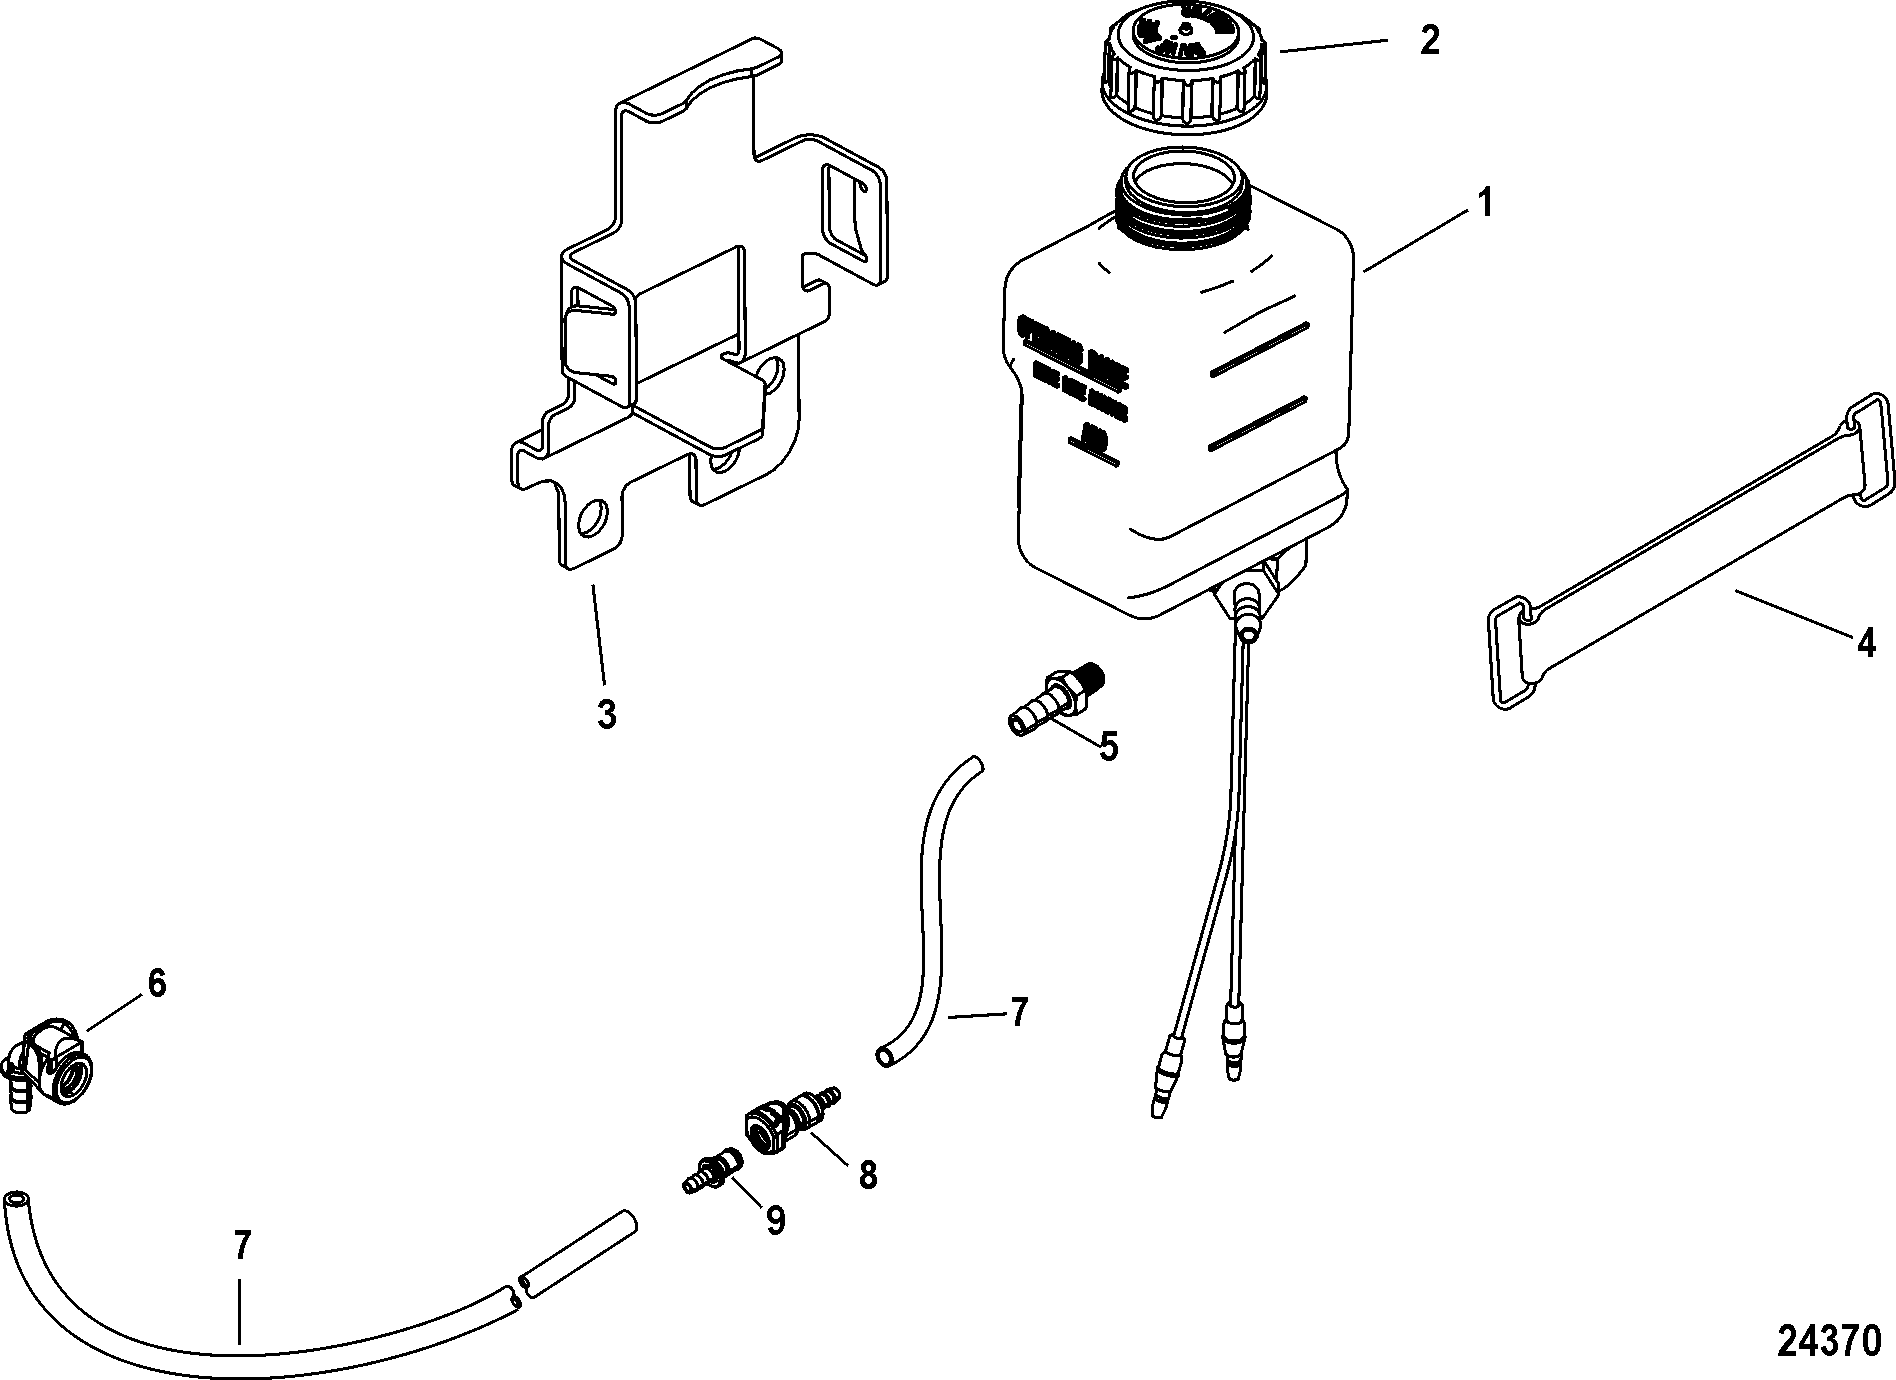 Mercruiser 496 Mag H O Model